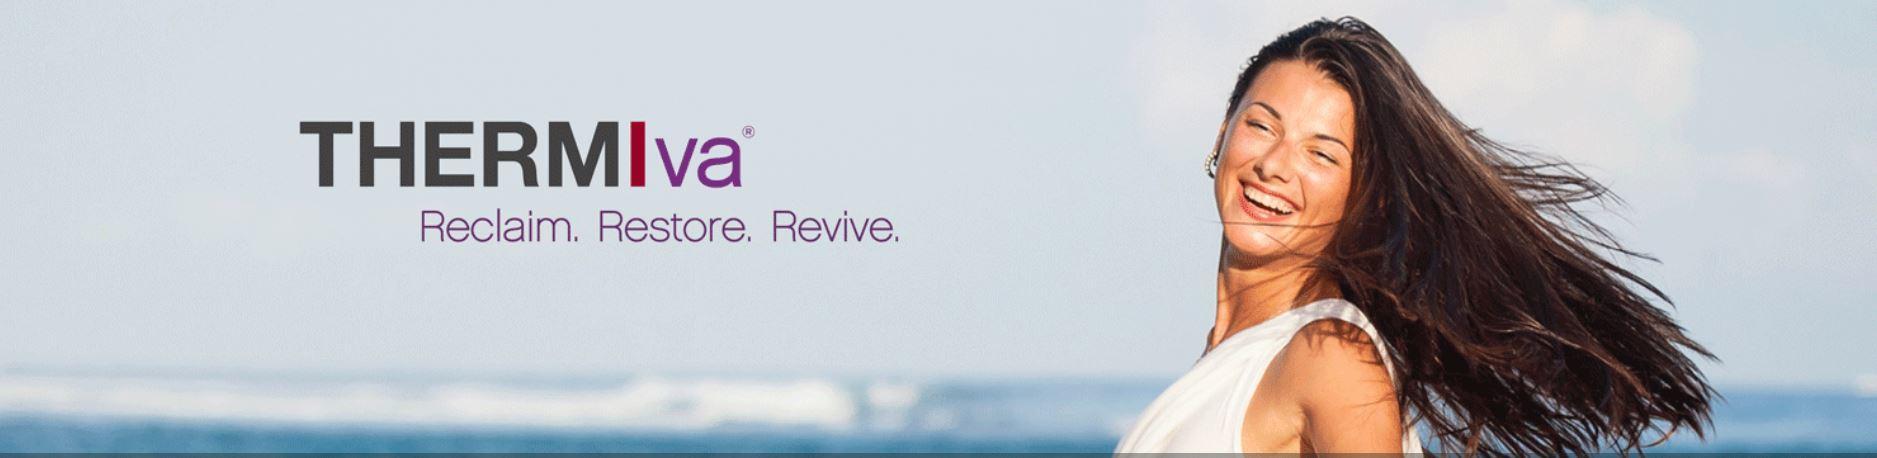 ThermiVa vaginal rejuvination